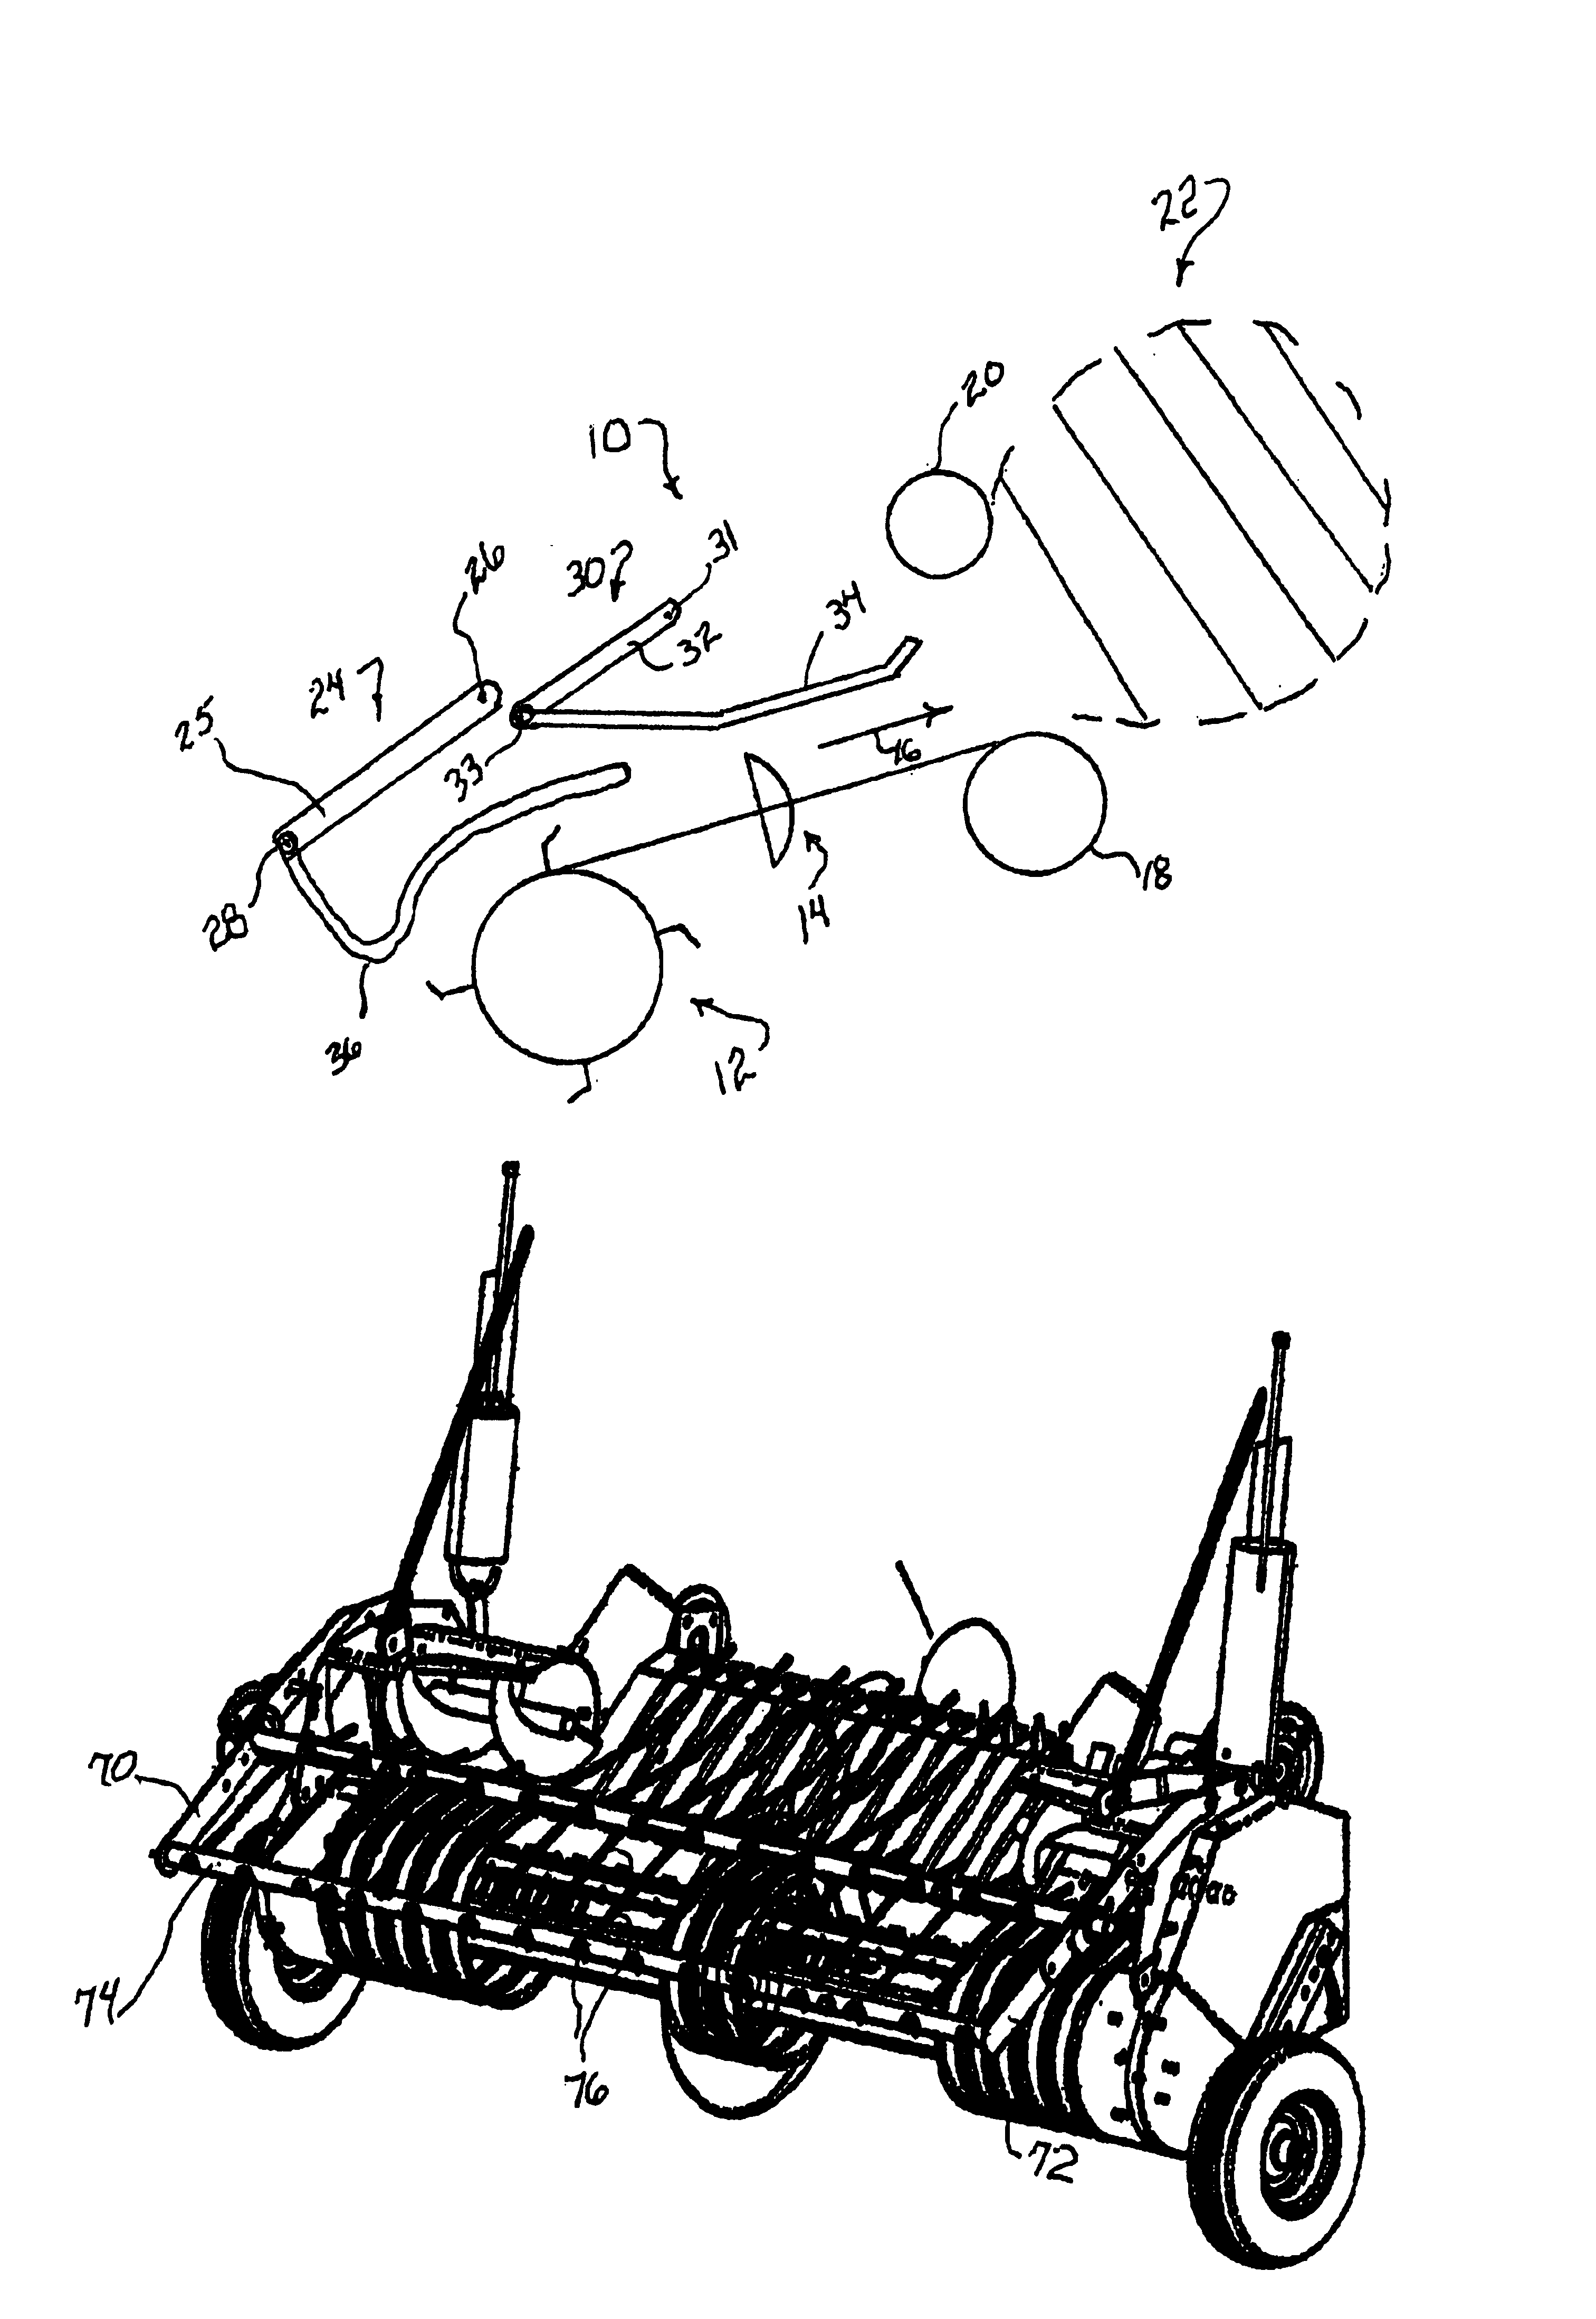 patent us6877304 windguard for round baler patents International Harvester Pickup Trucks History patent drawing